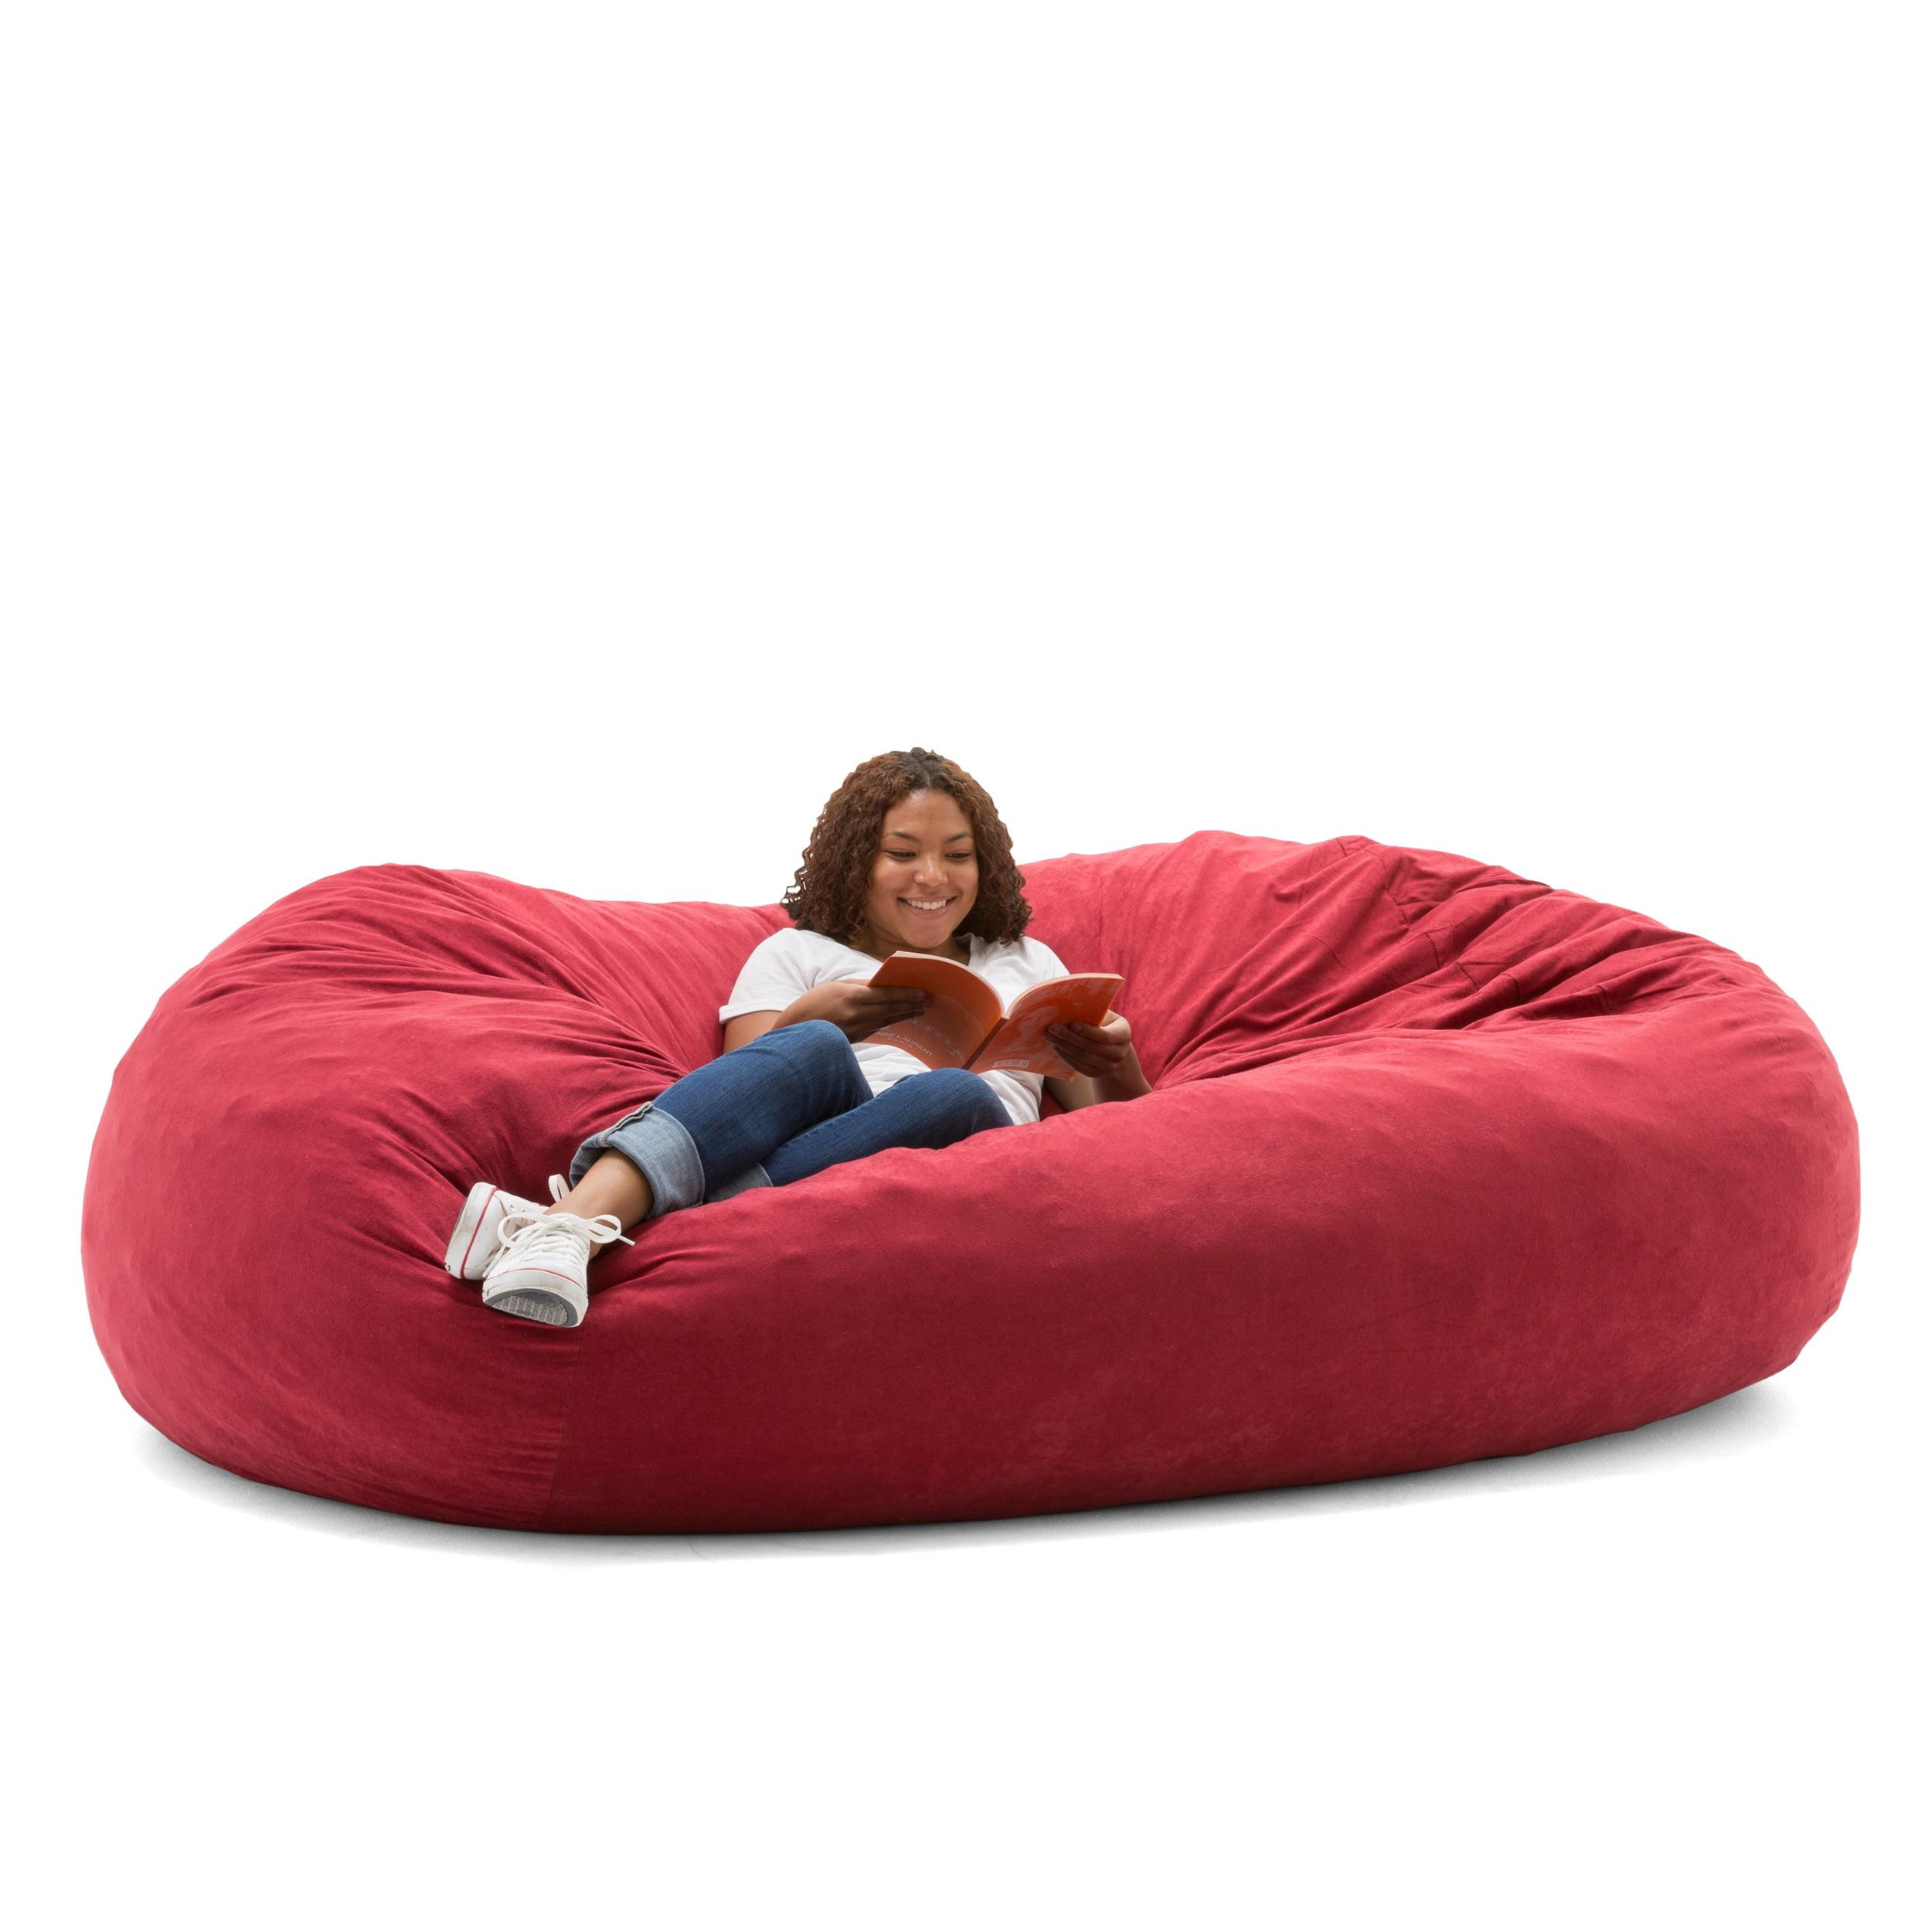 Awe Inspiring Big Joe Xxl 7 Fuf Bean Bag Chair Multiple Colors Fabrics Ncnpc Chair Design For Home Ncnpcorg